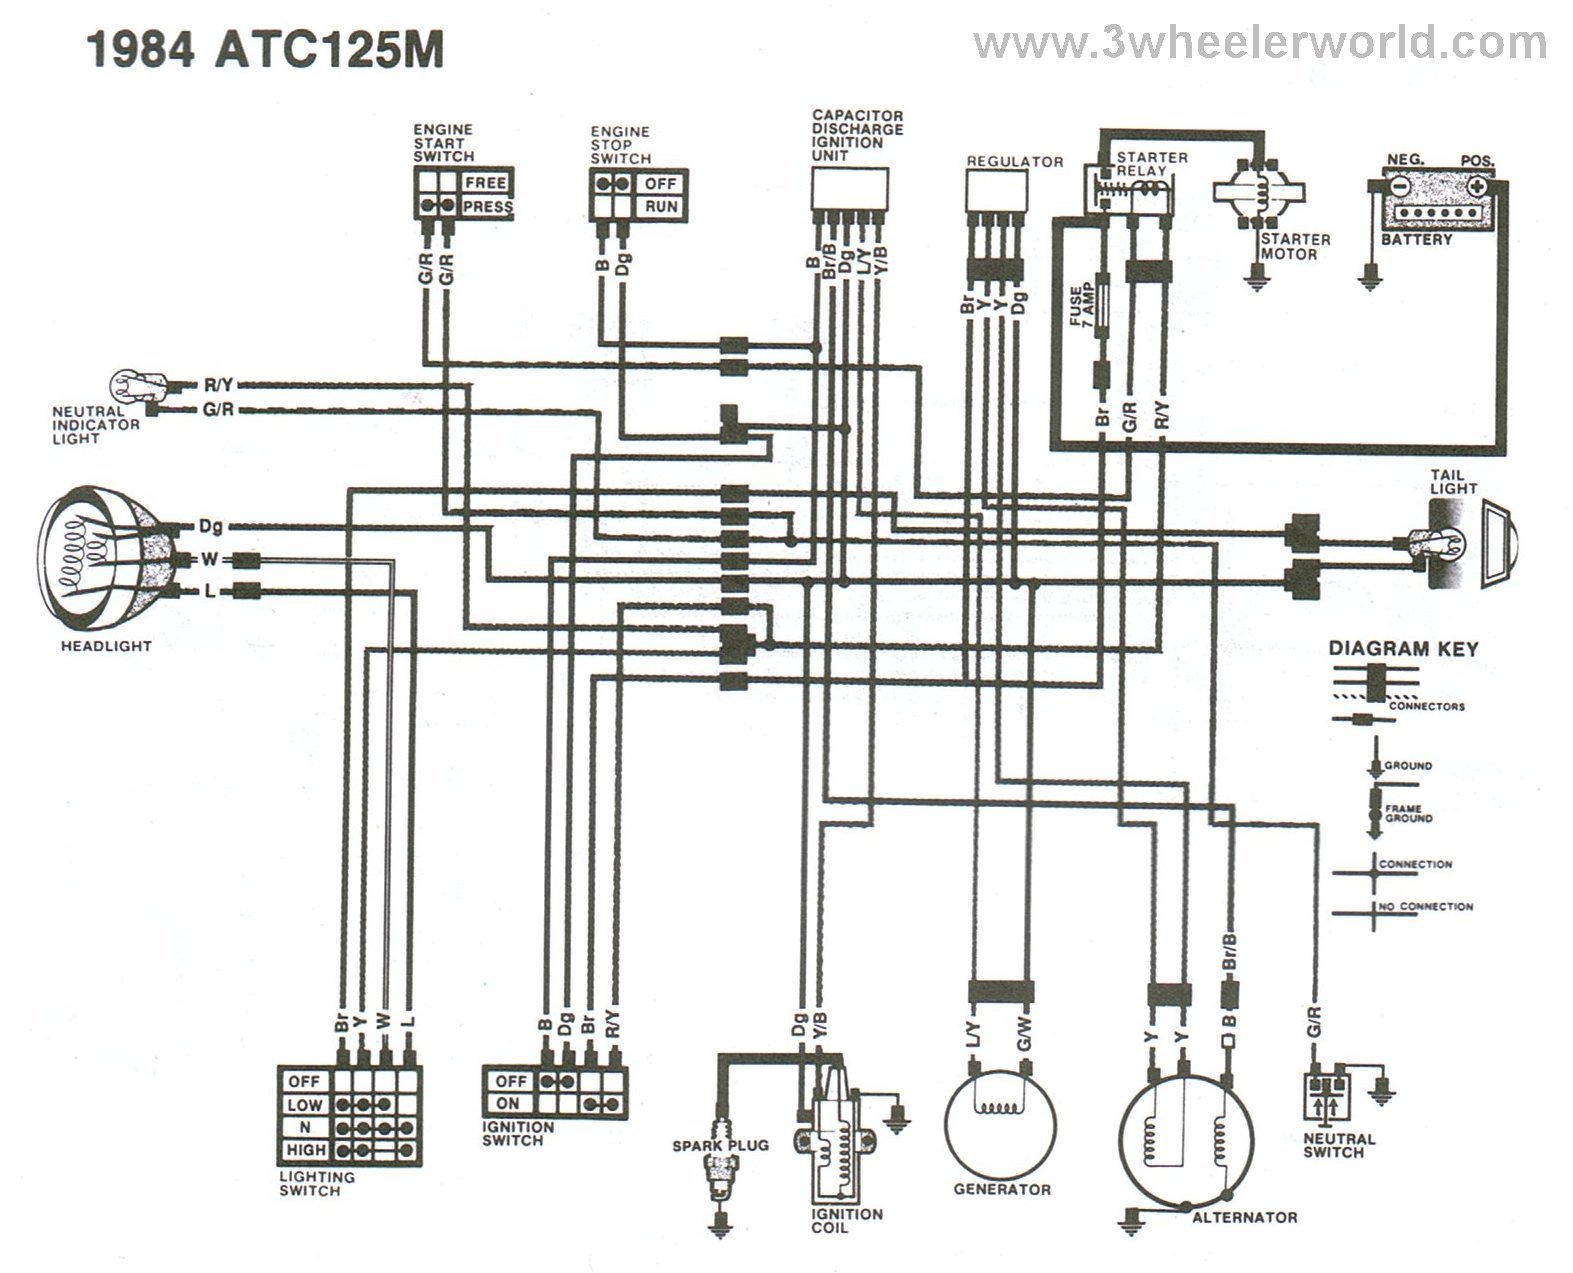 gy6 5 wire rectifier wiring diagram   35 wiring diagram